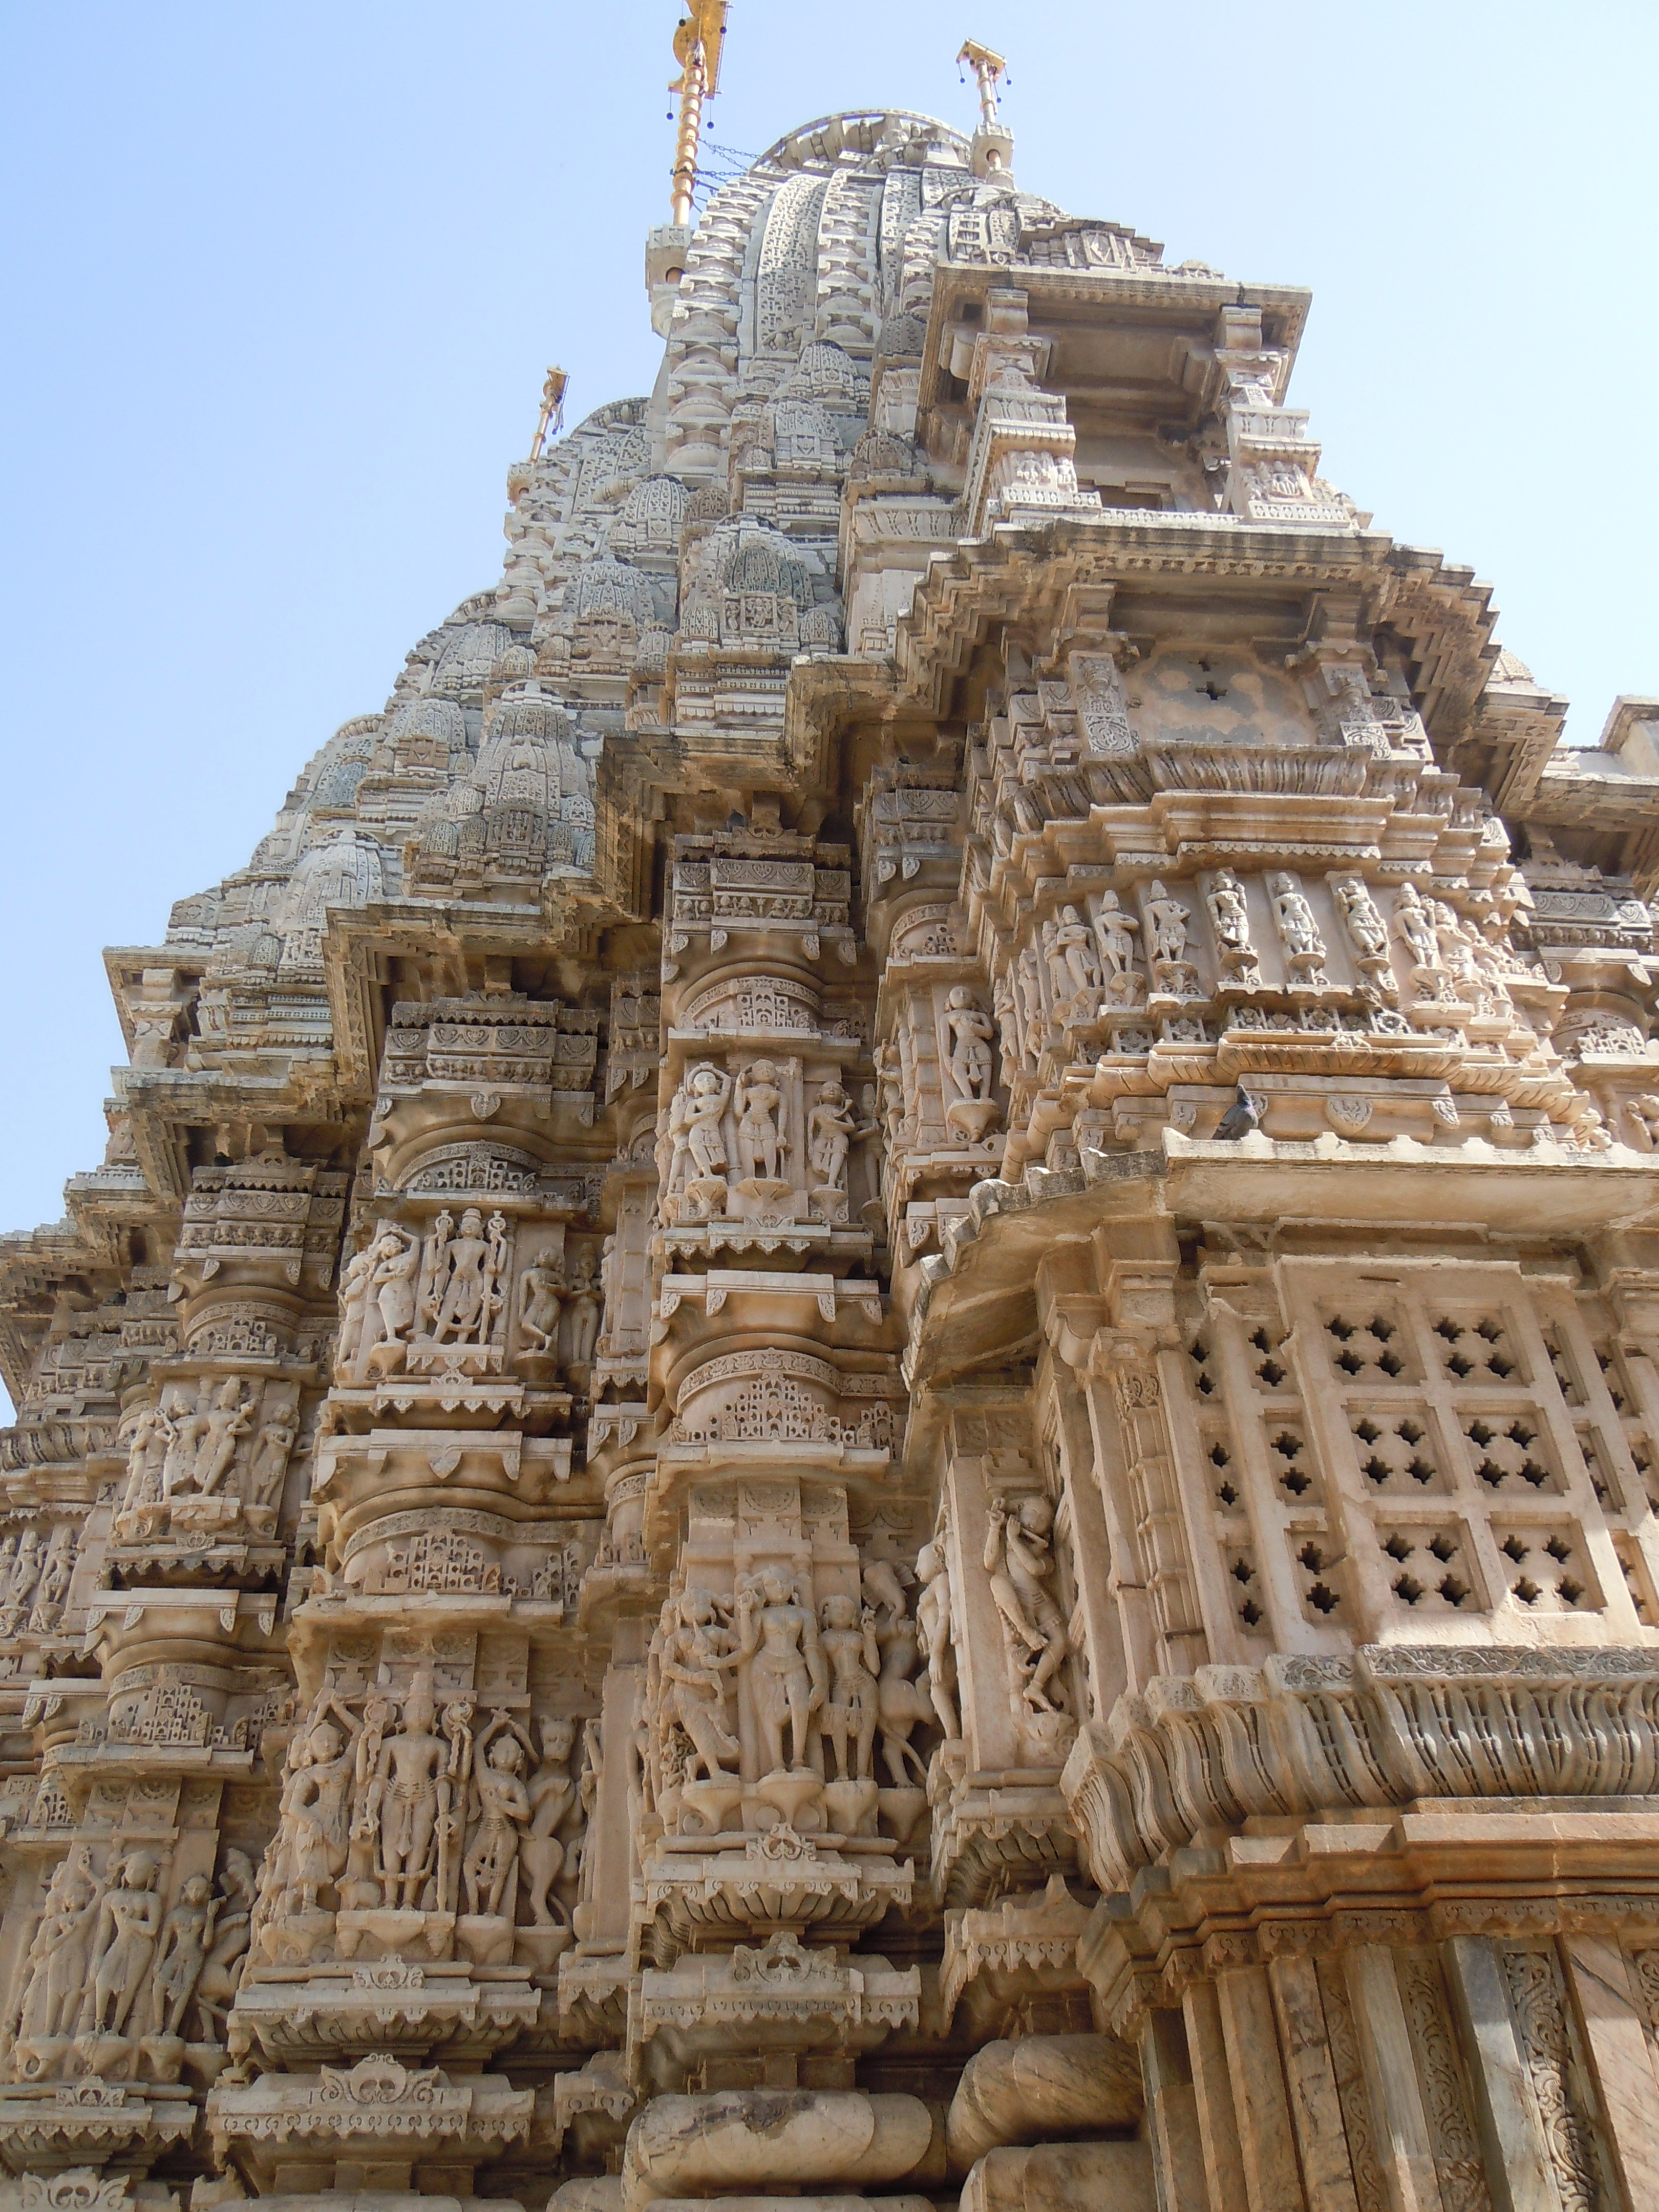 File:Jagdish Temple (Udaipur) - base du mandapa.jpg ... Jagdish Temple Udaipur